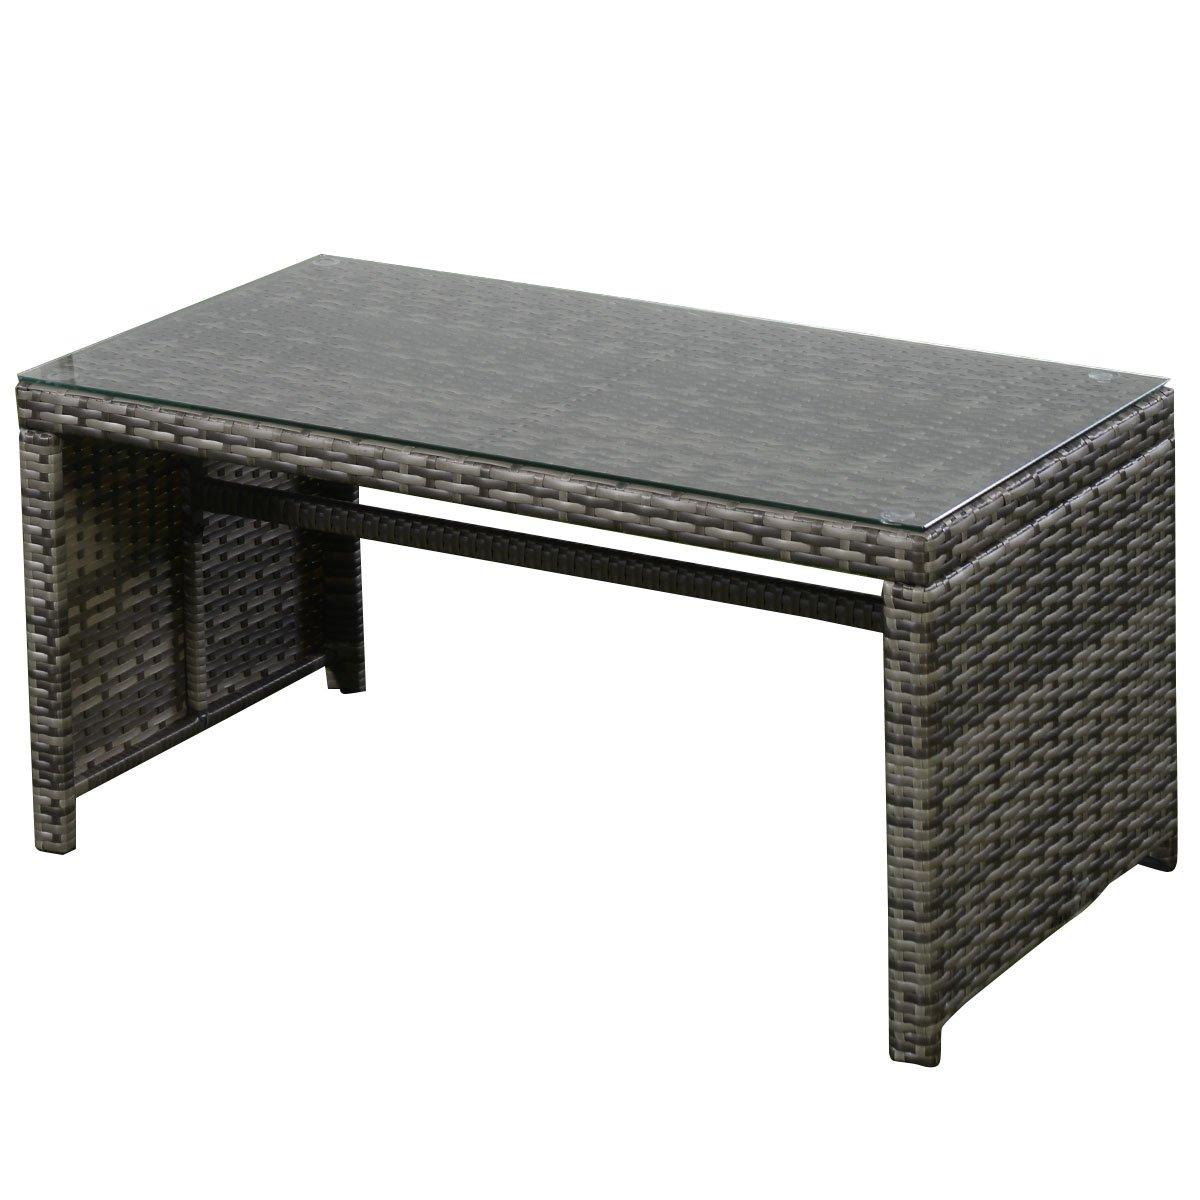 gray outdoor patio set. amazon.com: goplus 4 pc rattan patio furniture set garden lawn sofa cushioned seat wicker (mix gray): \u0026 outdoor gray e